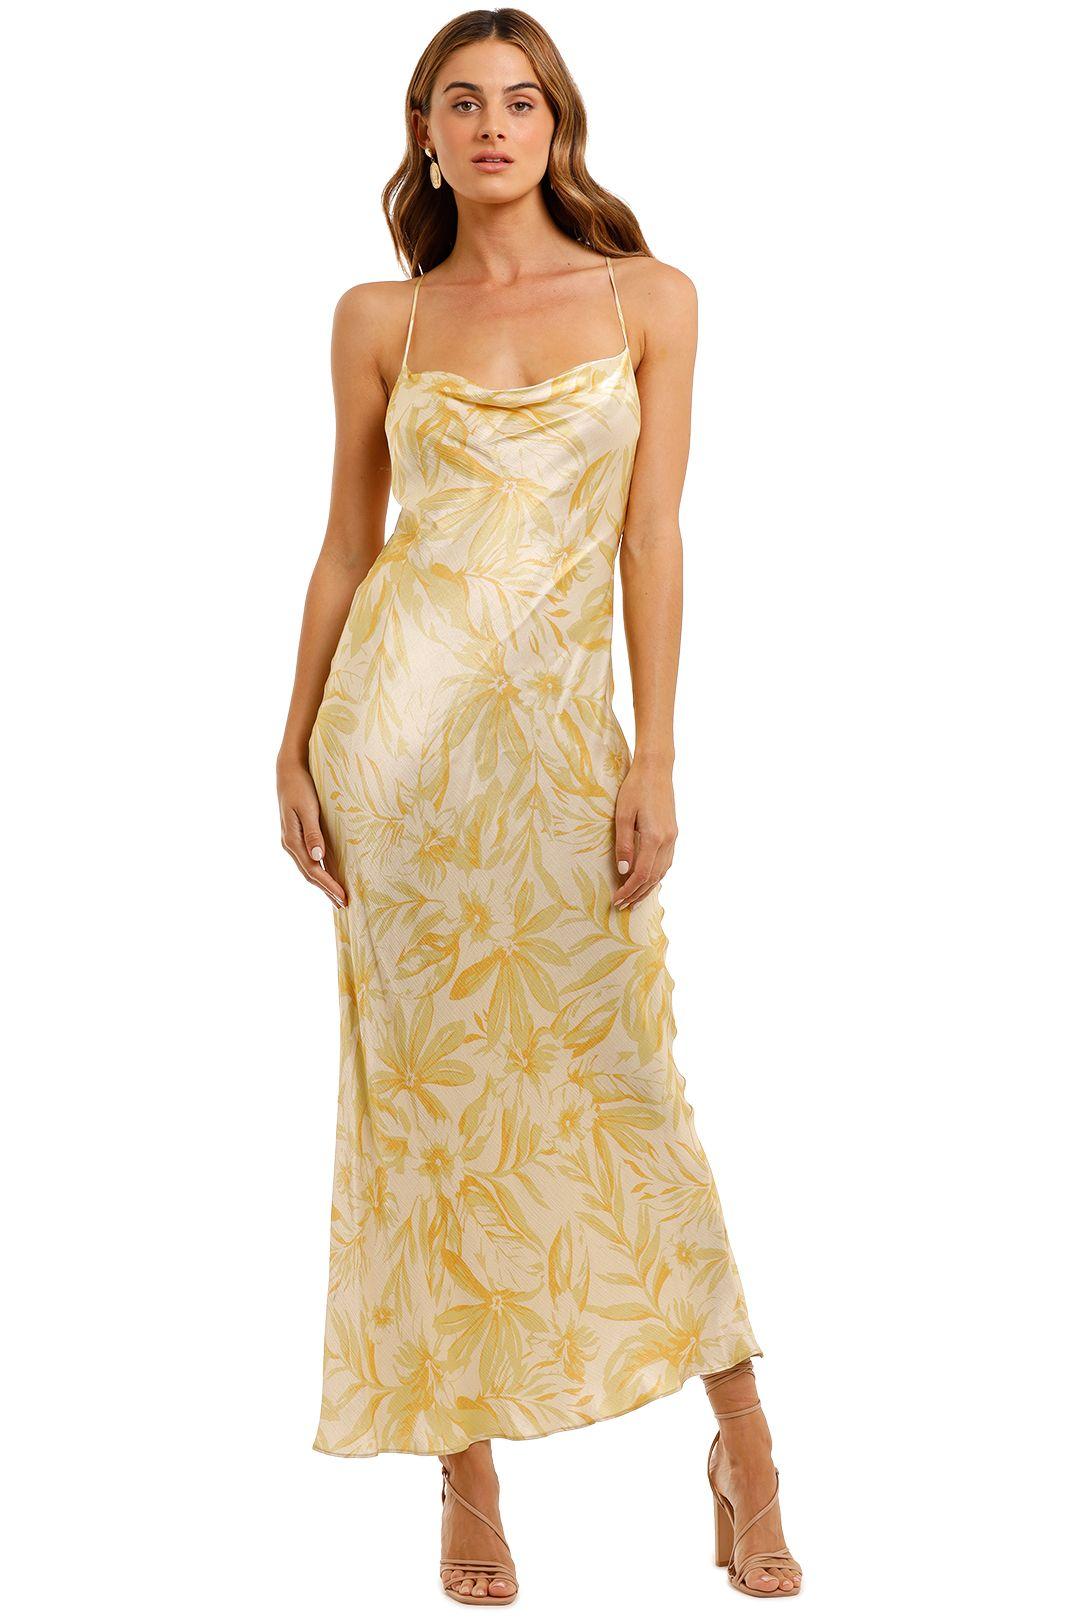 Bec and Bridge Tropical Punch Midi Dress Yellow